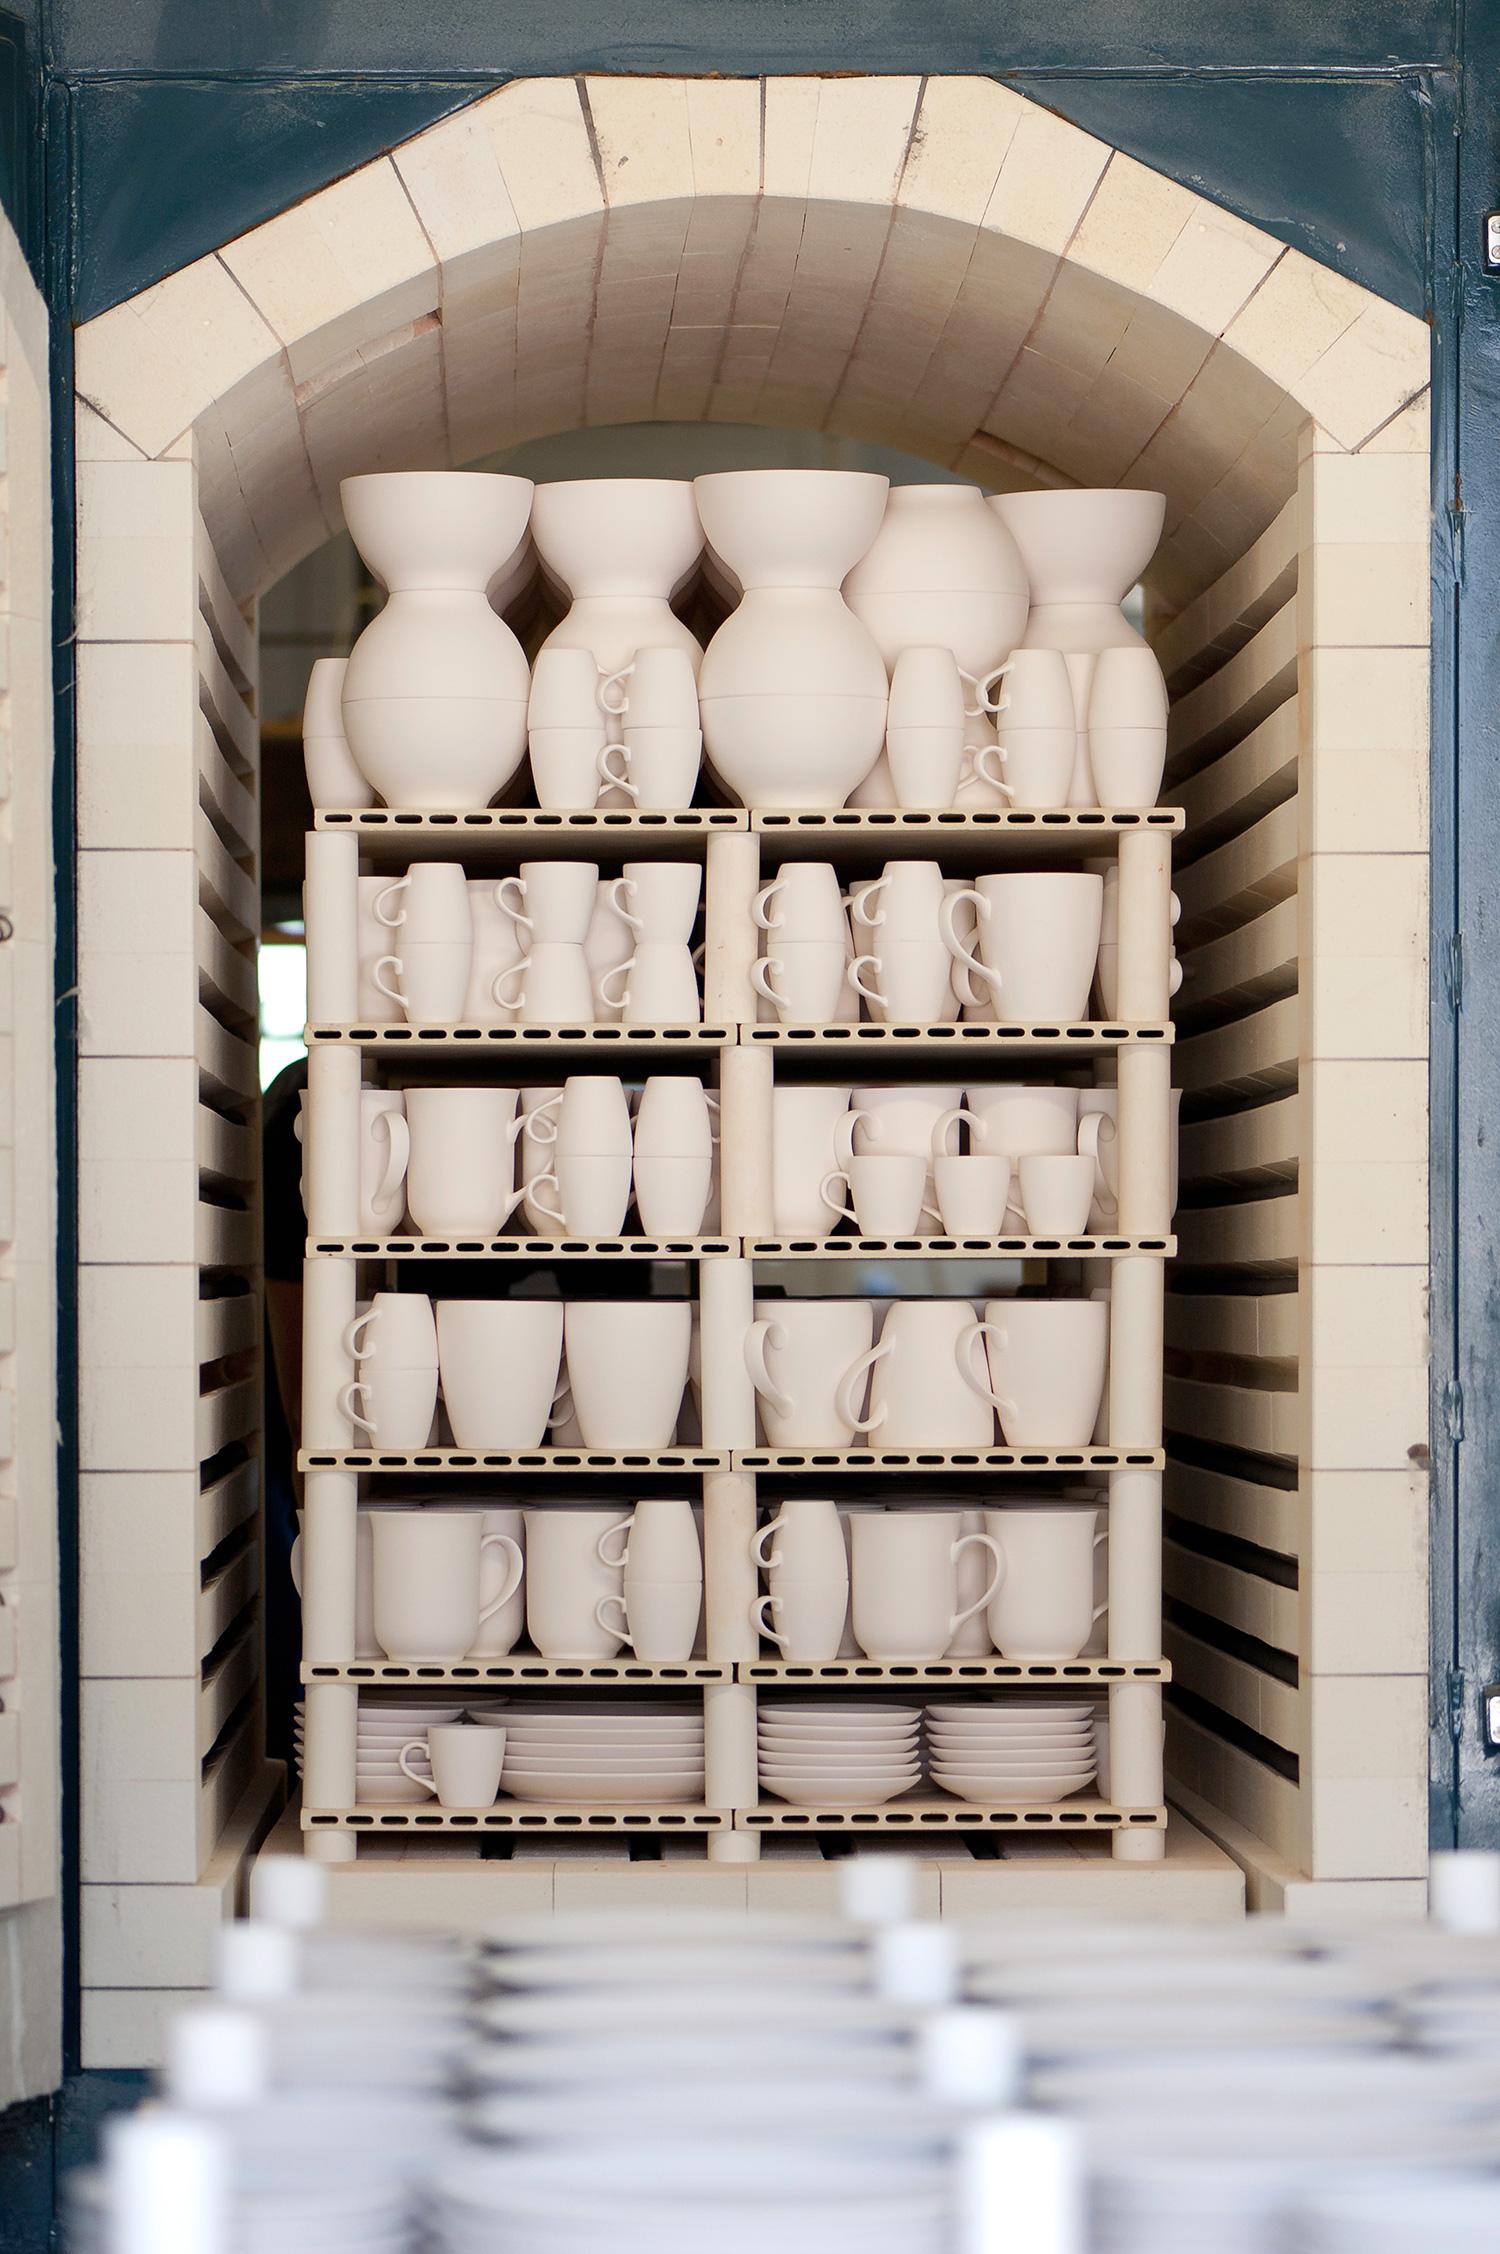 kapula-handmade-hand-crafted-ceramics-bowls-mugs-kiln.jpg